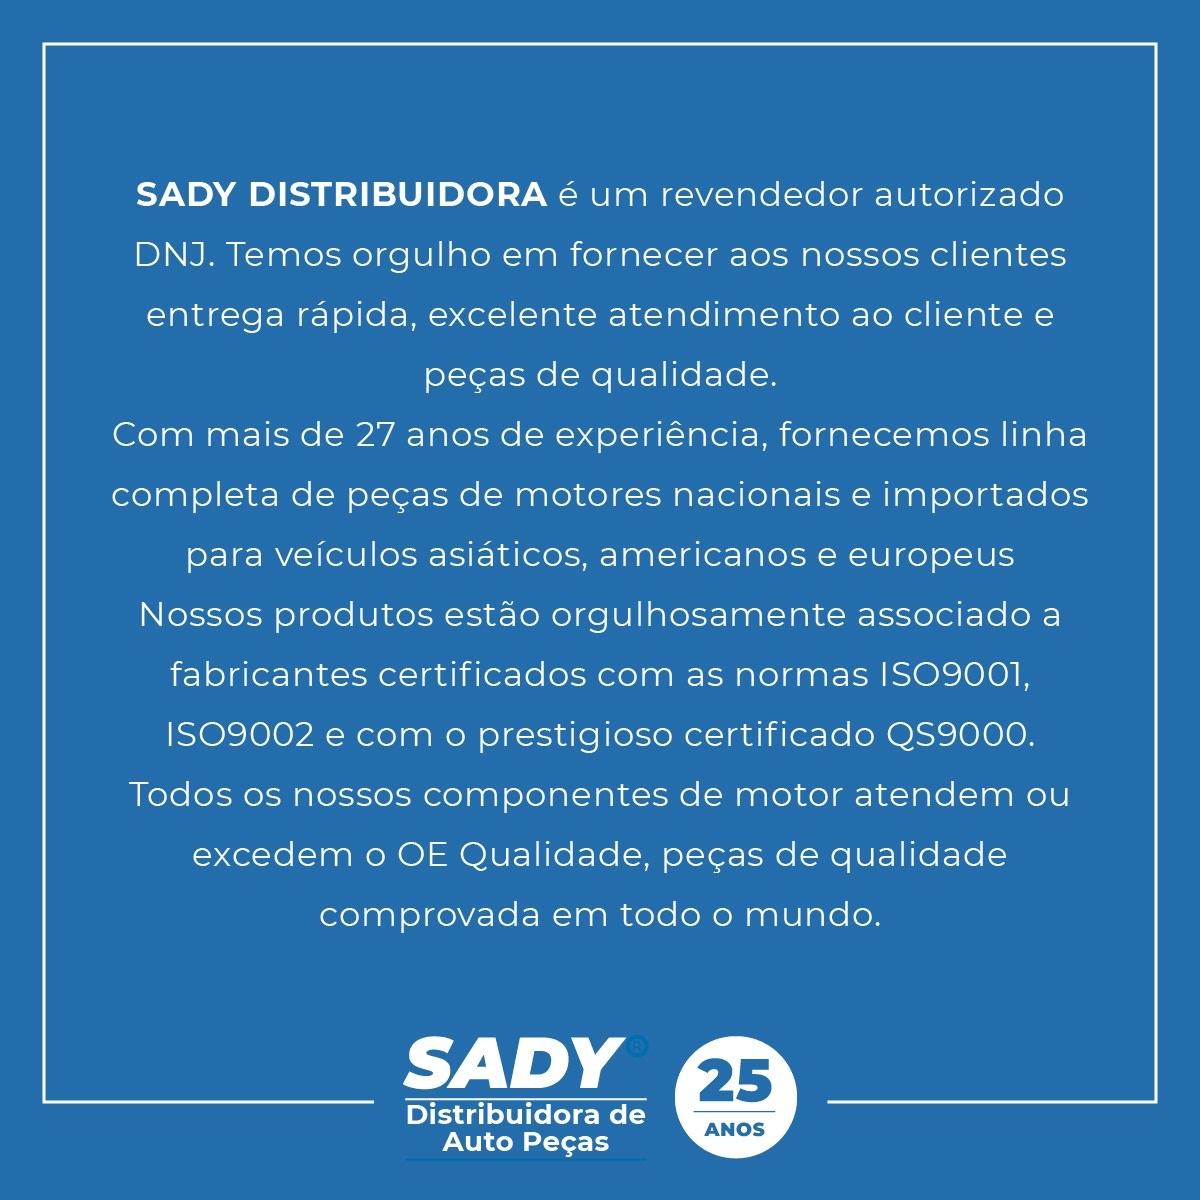 BOMBA DE OLEO DO MOTOR LAND ROVER 3.6/4.4 32V TDI